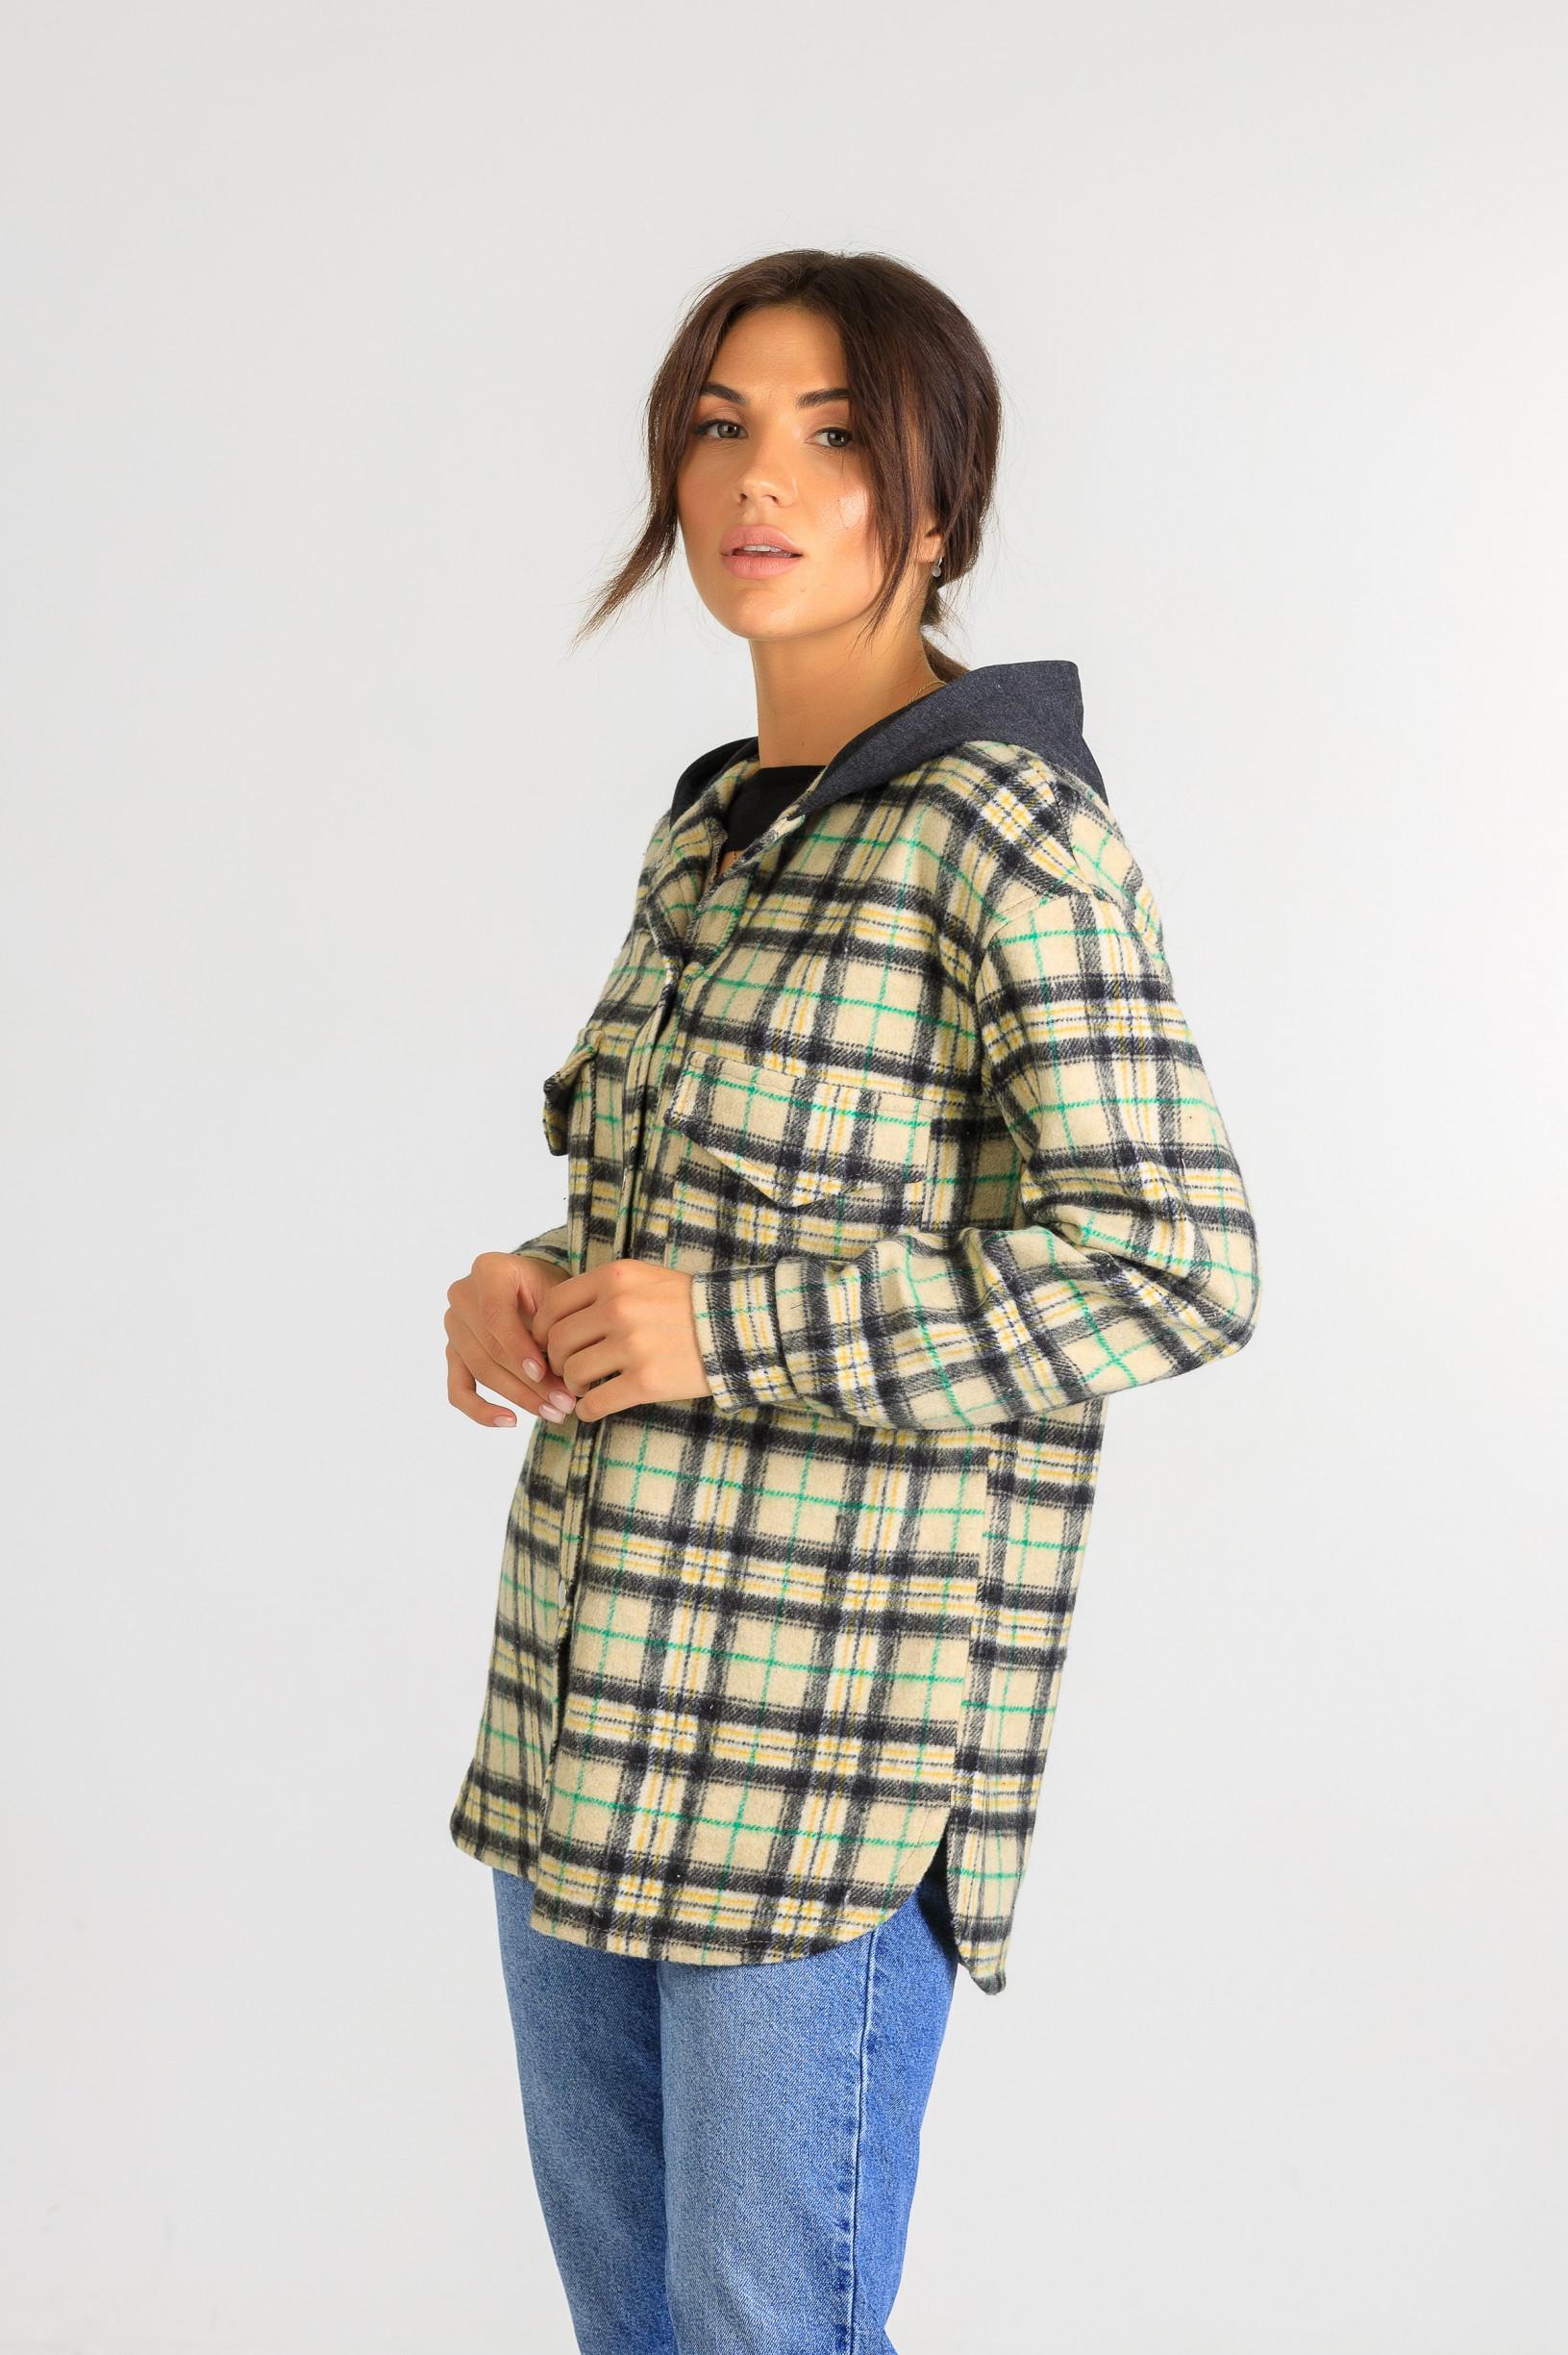 Кардиган-рубаха с капюшоном в клетку Р951 бежевый